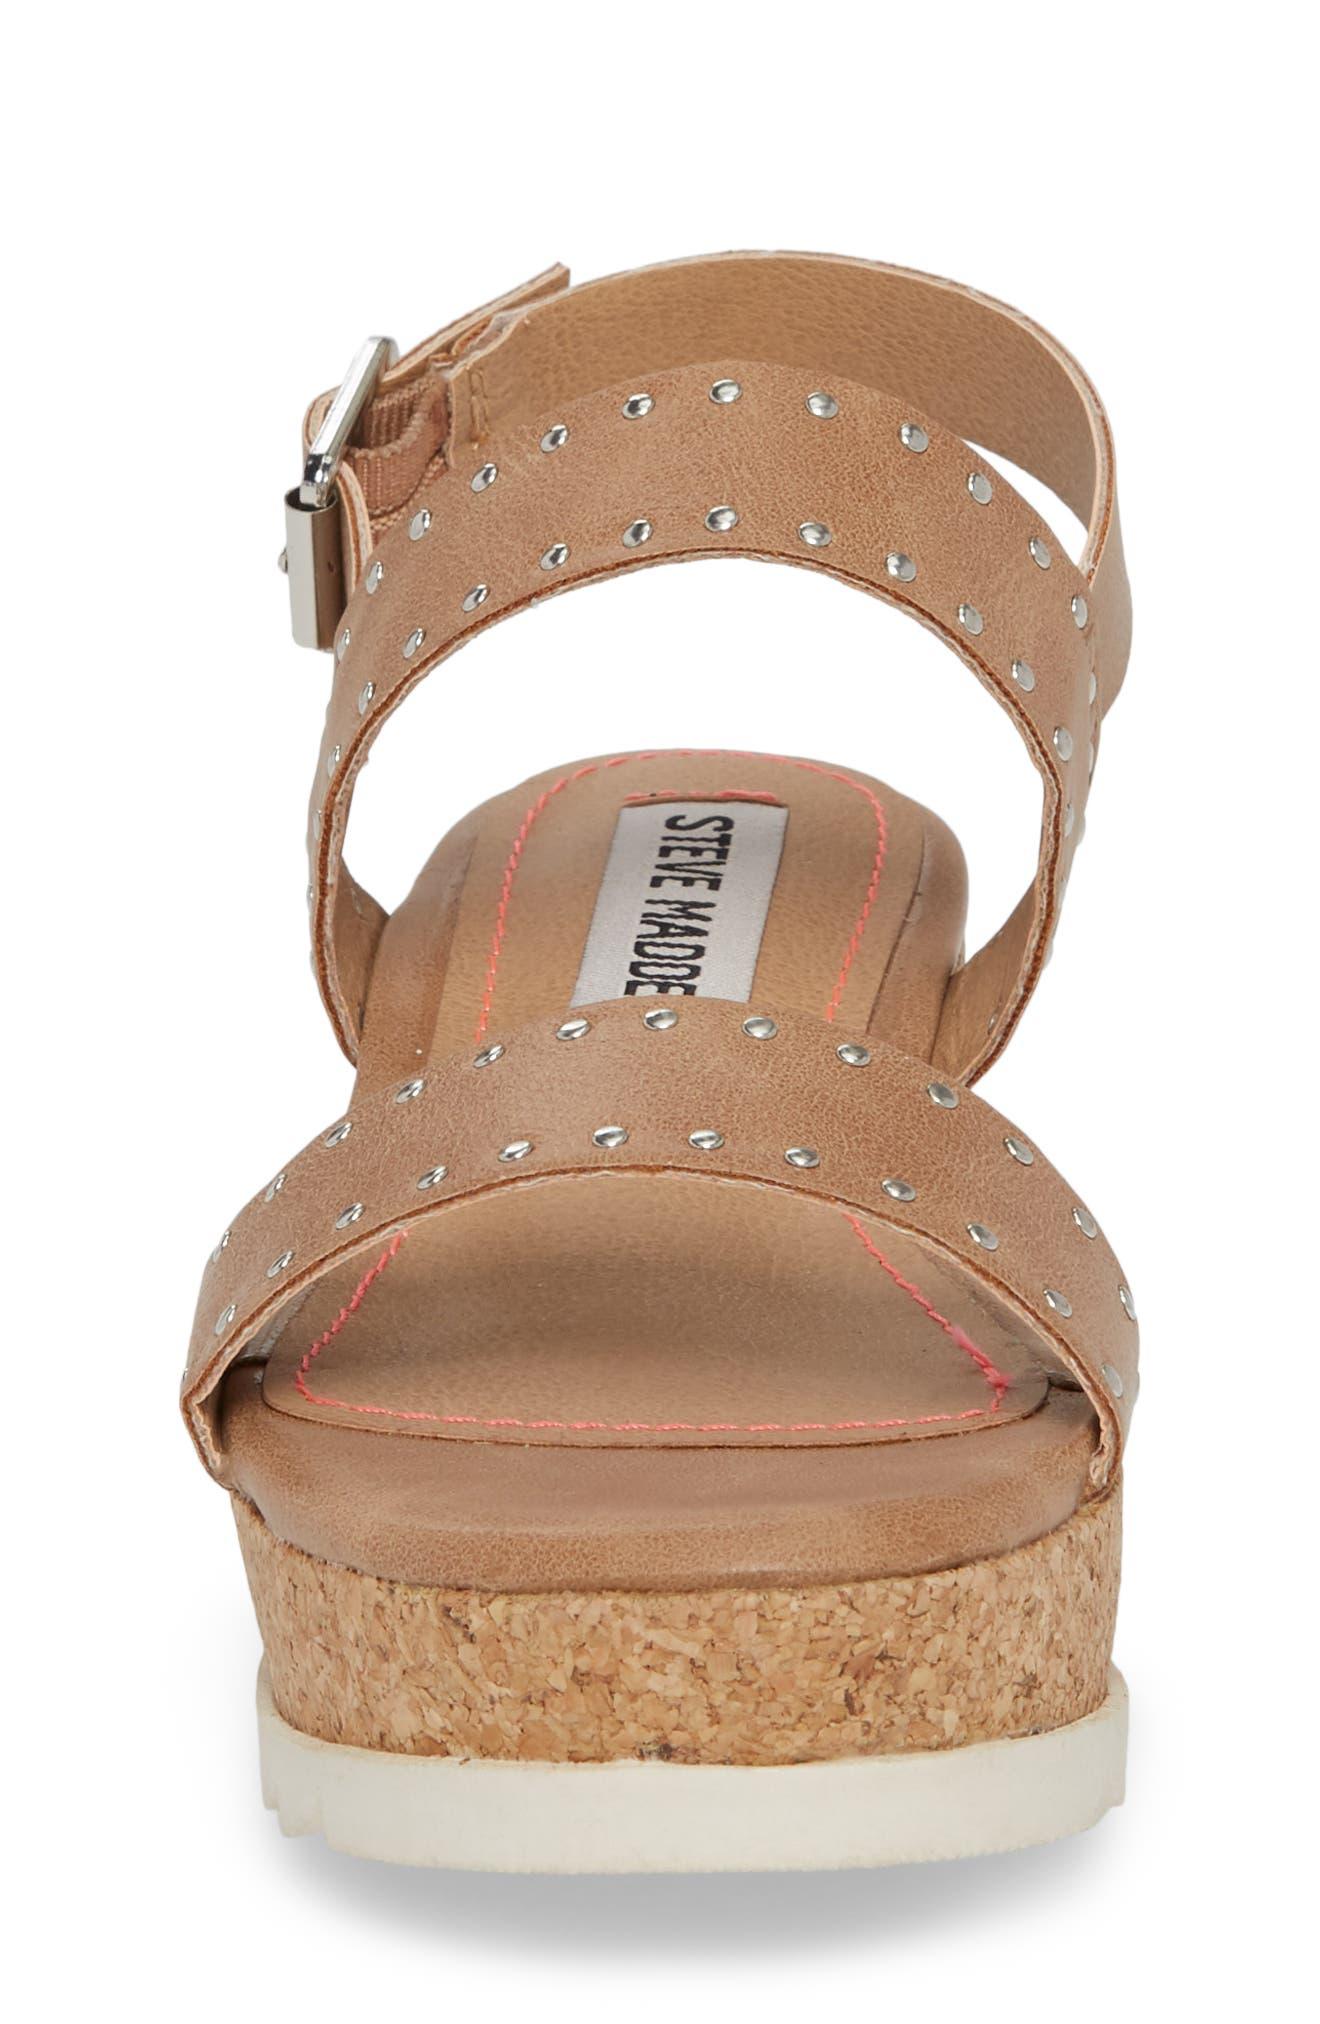 JKRISTIE Platform Sandal,                             Alternate thumbnail 4, color,                             Natural